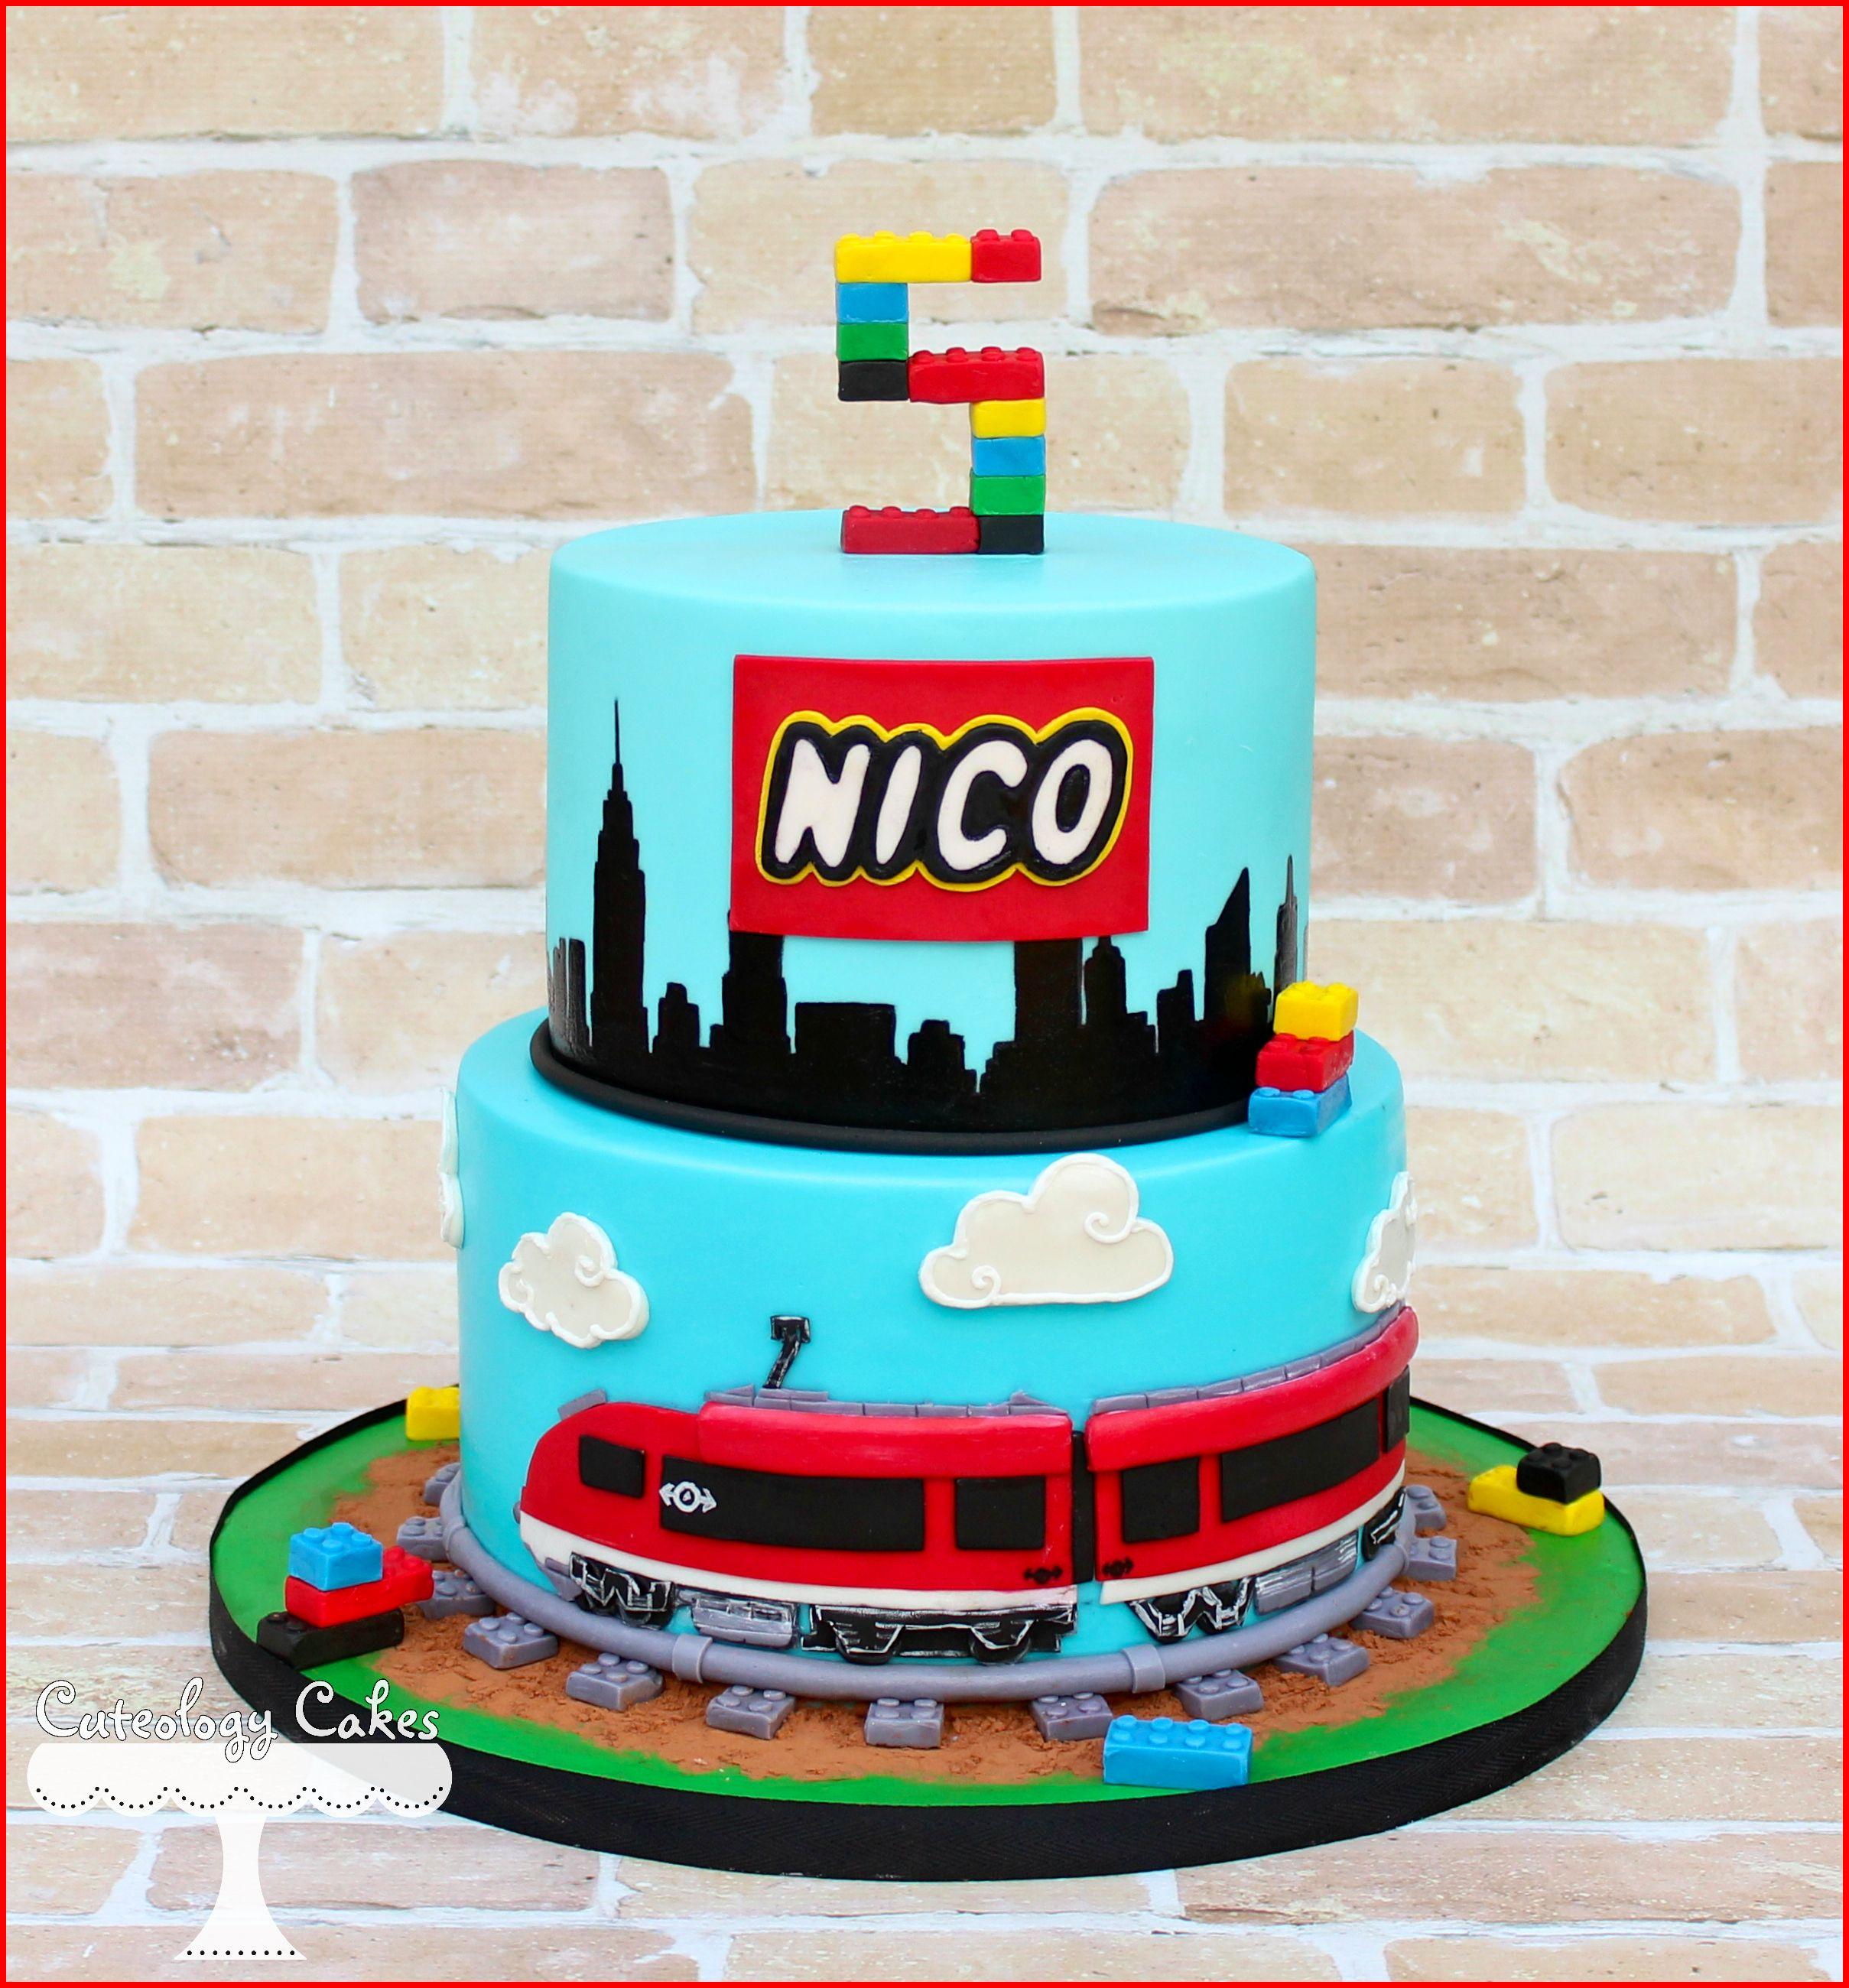 Lego City Themed Cake With Train Tracks And Skyline